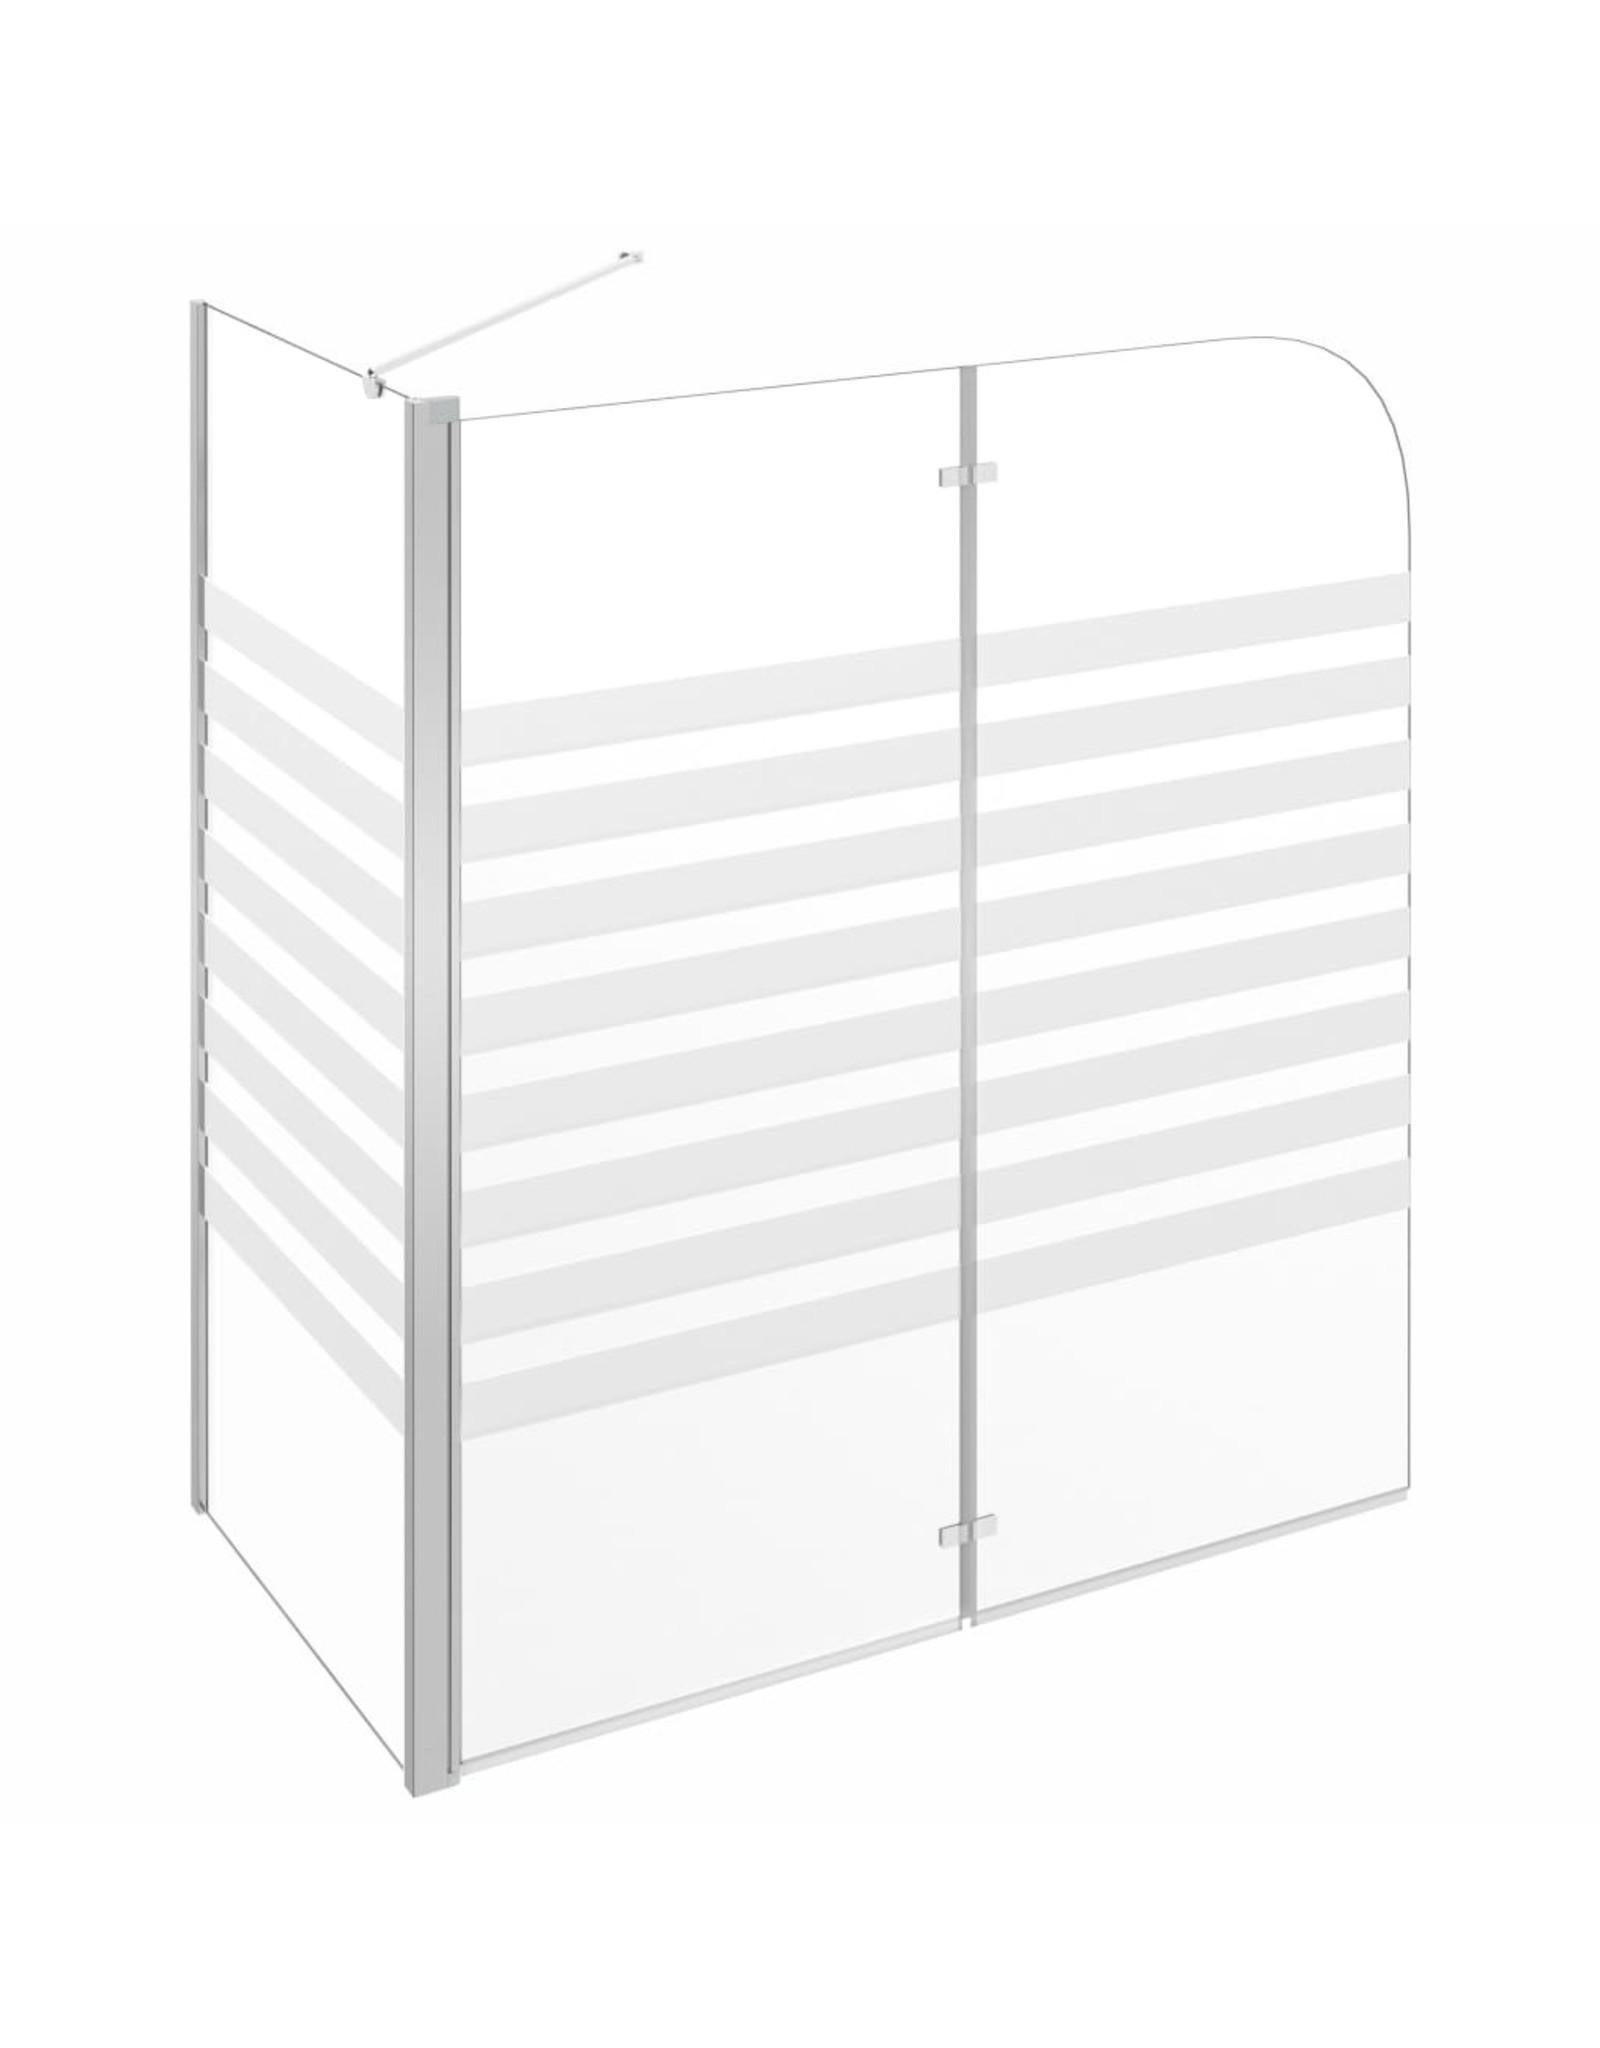 Badwand gestreept 120x68x130 cm gehard glas